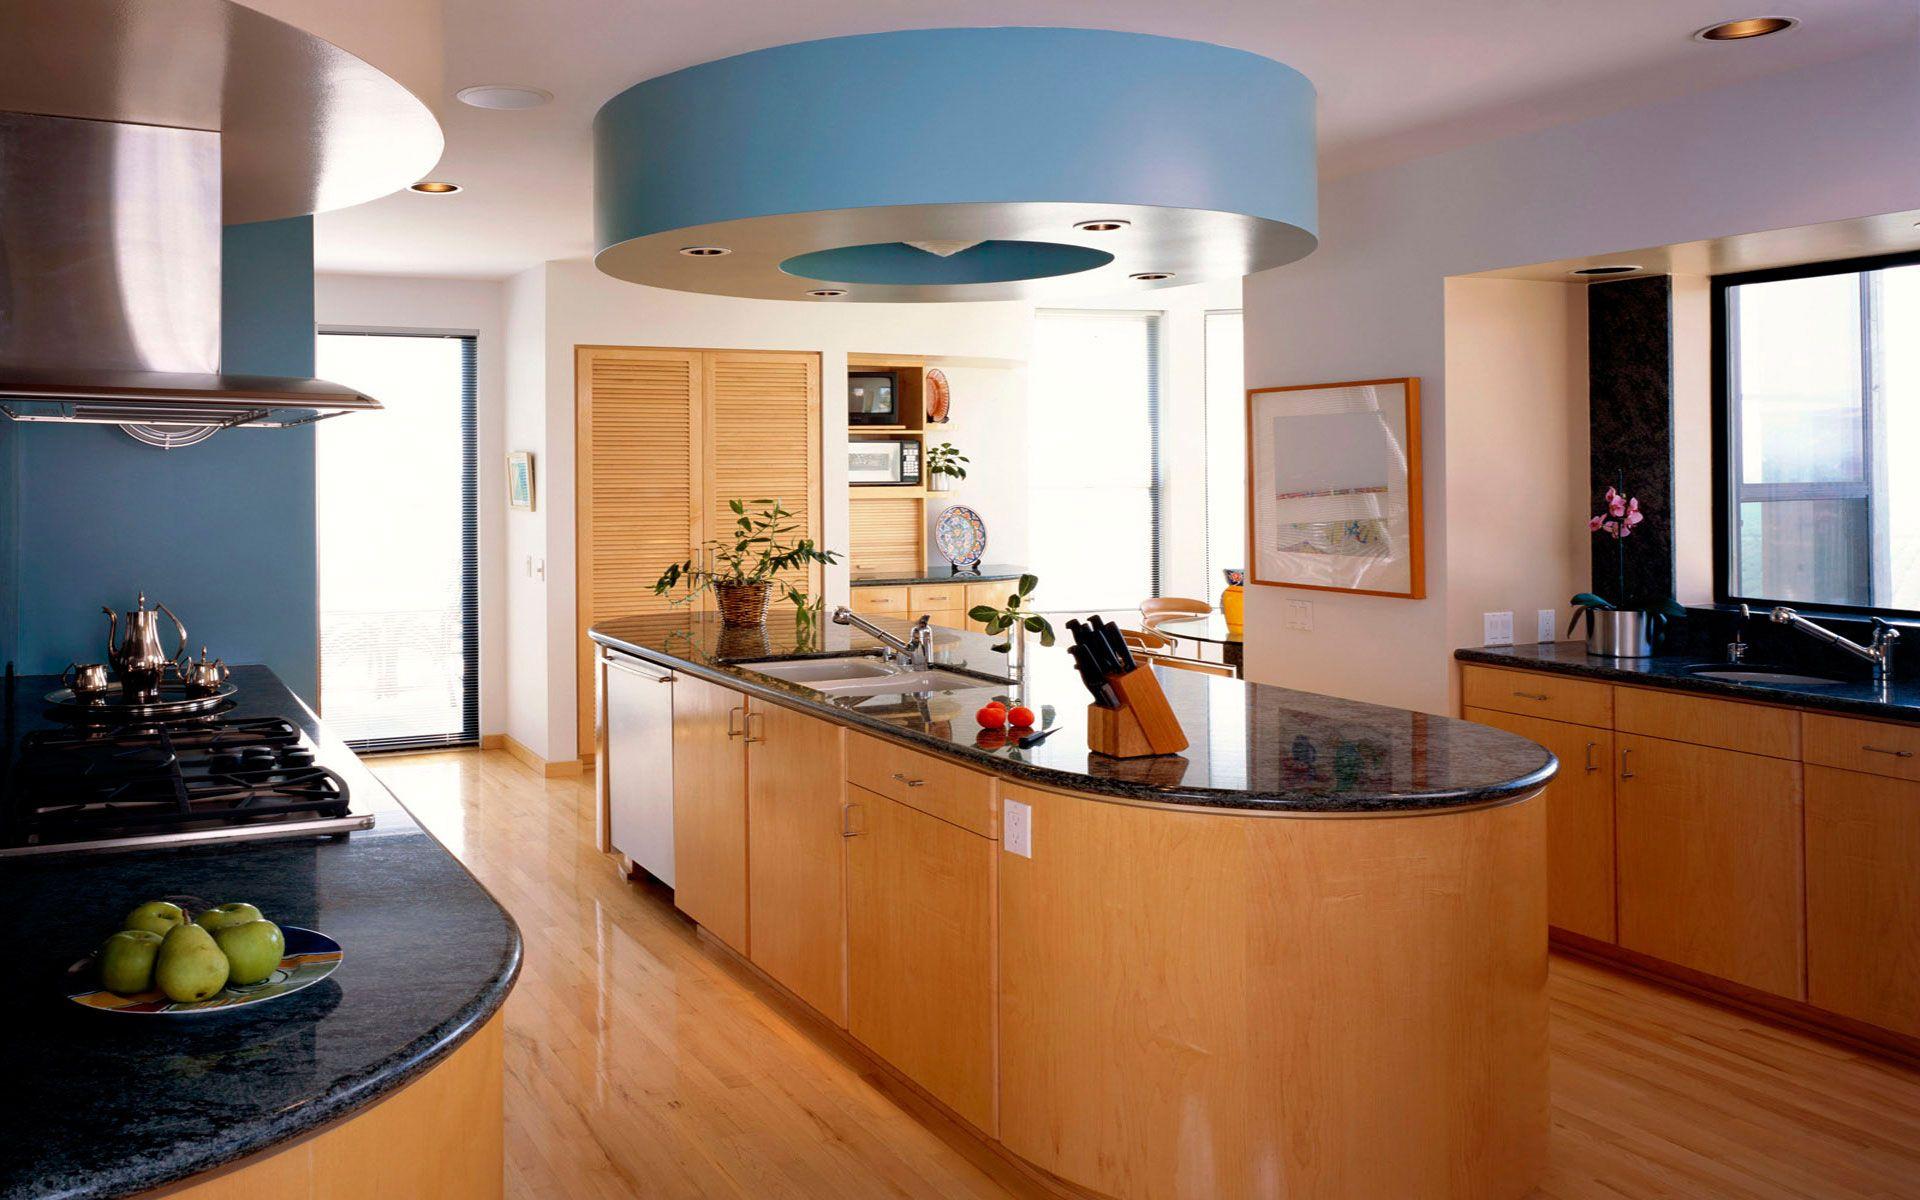 Best Interior Design Kitchen HD Wallpapers in HD